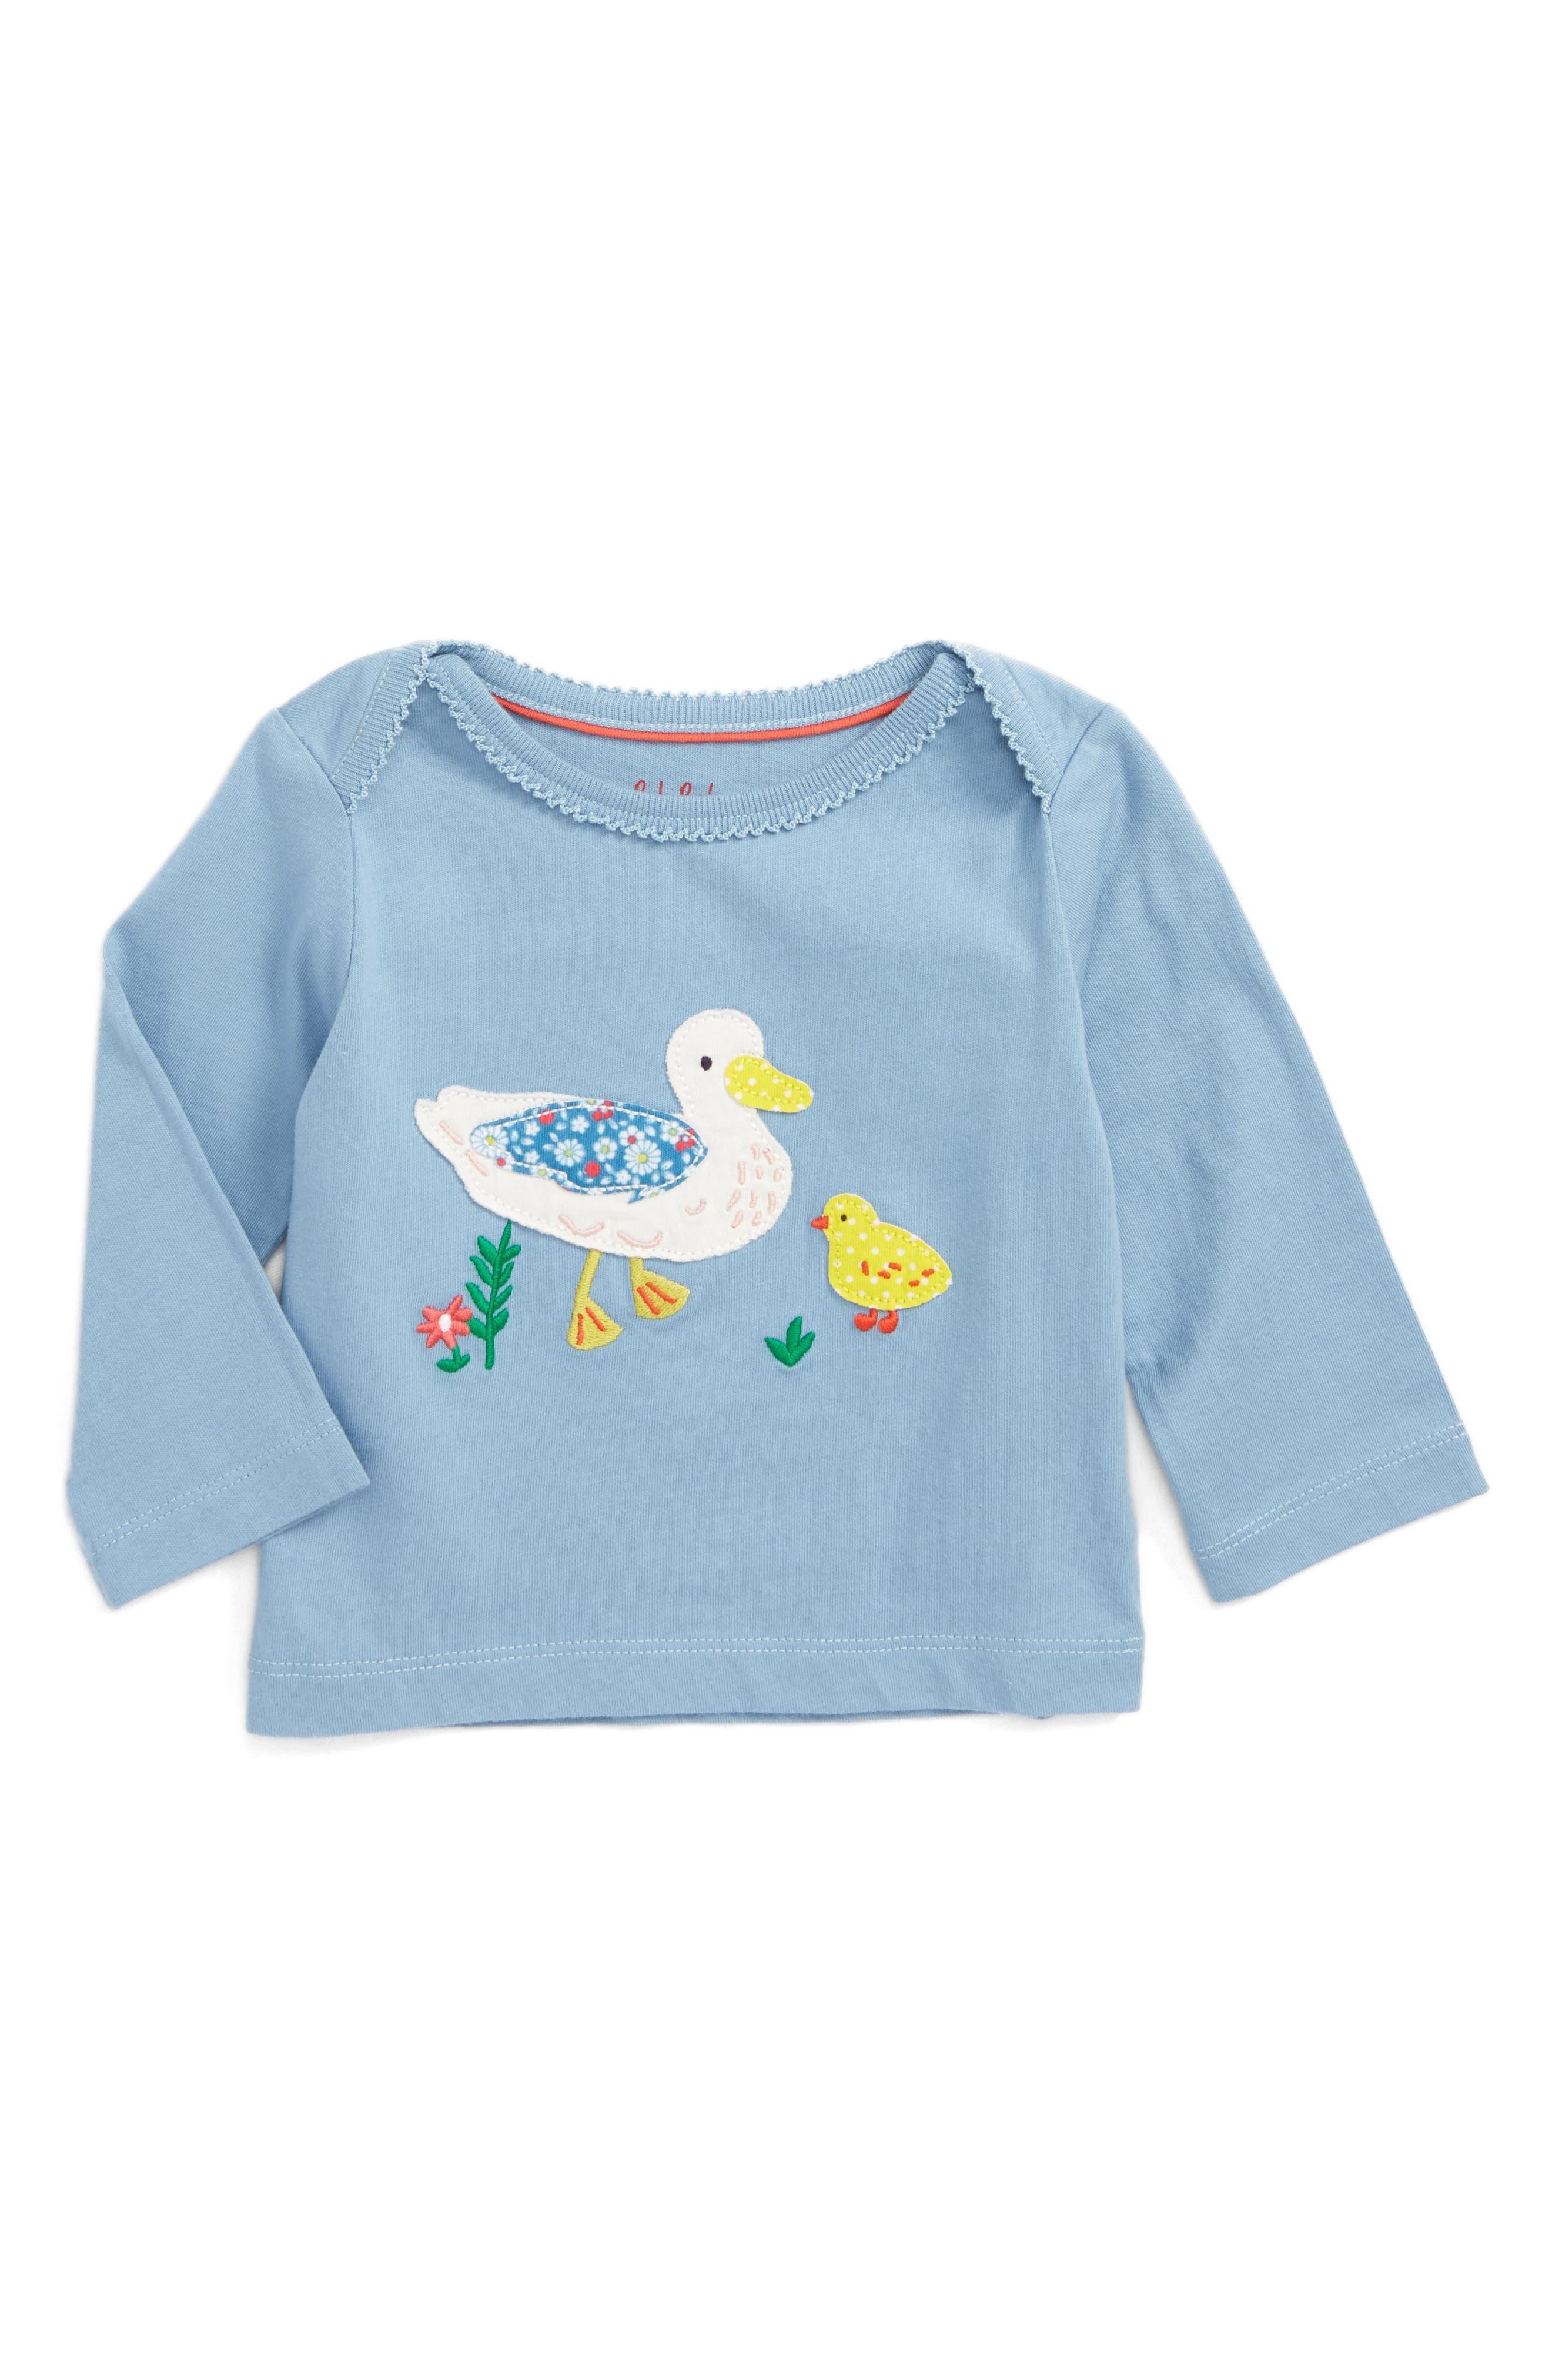 Mini Boden Woodland Appliqué Tee (Baby Girls & Toddler Girls)